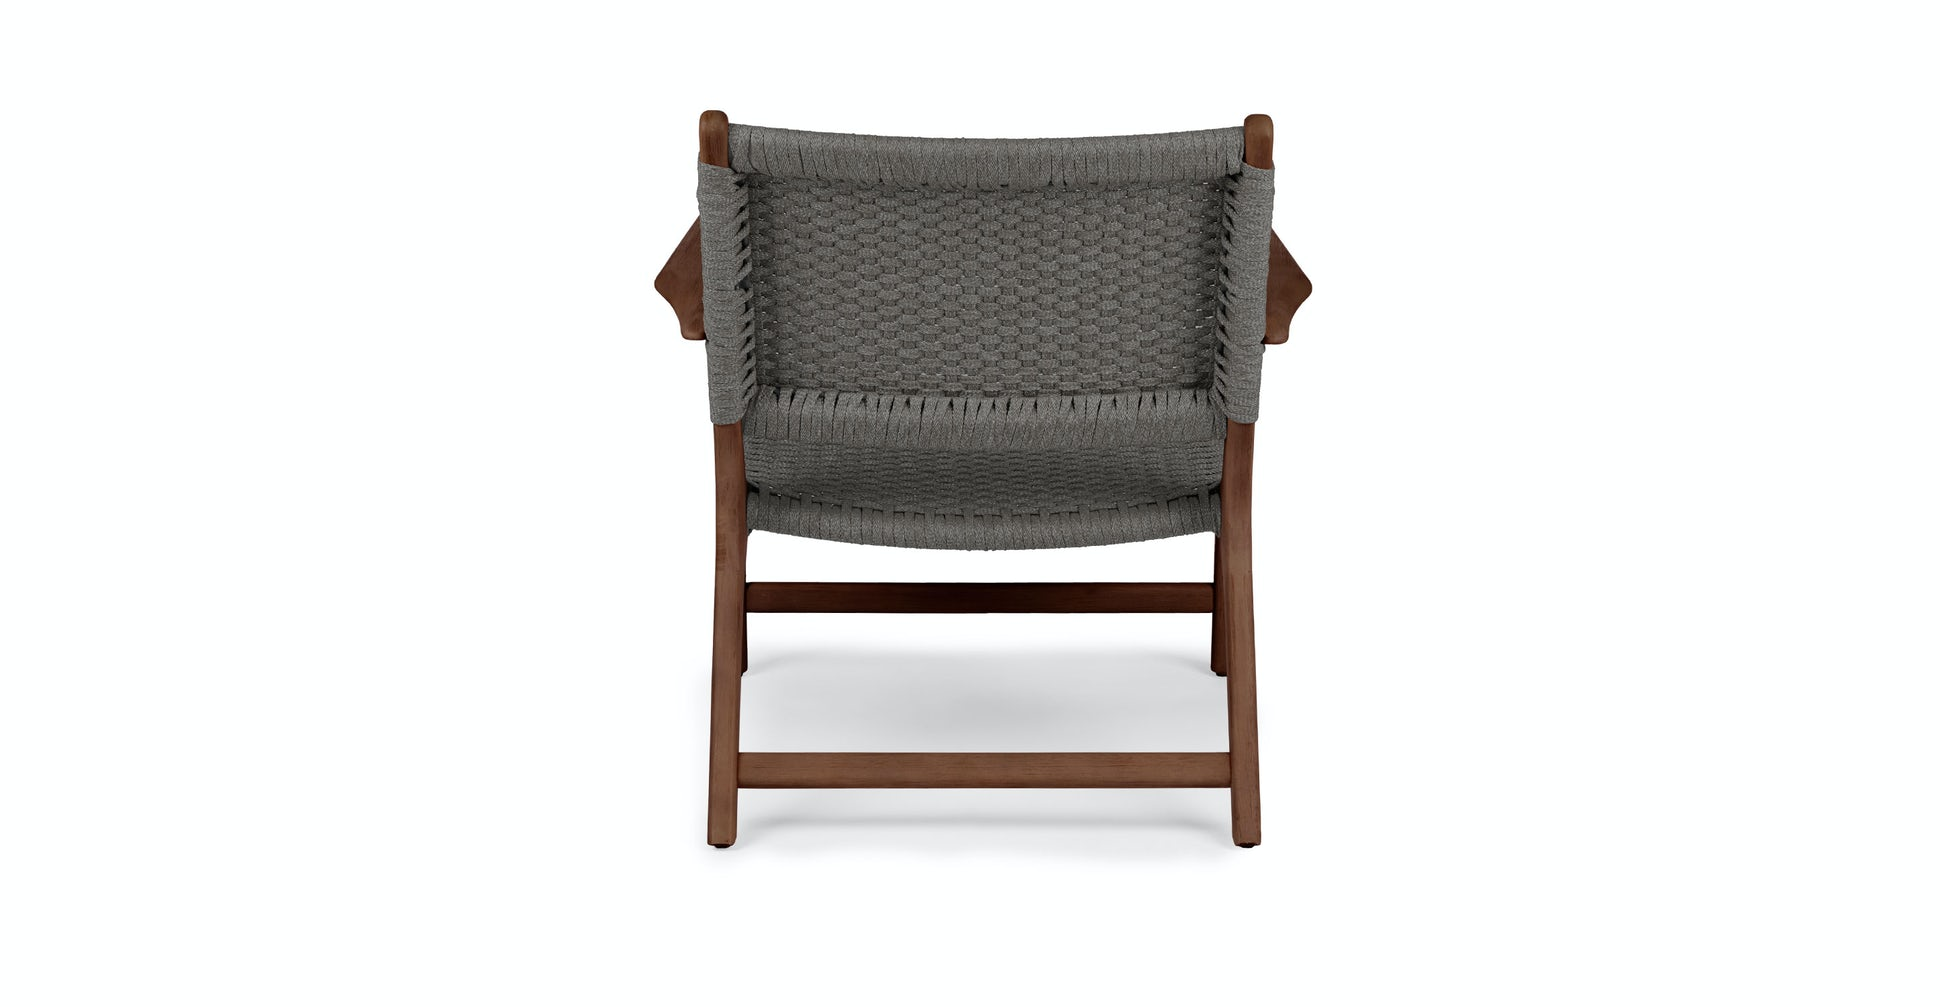 Reni Freckle Gray Lounge Chair